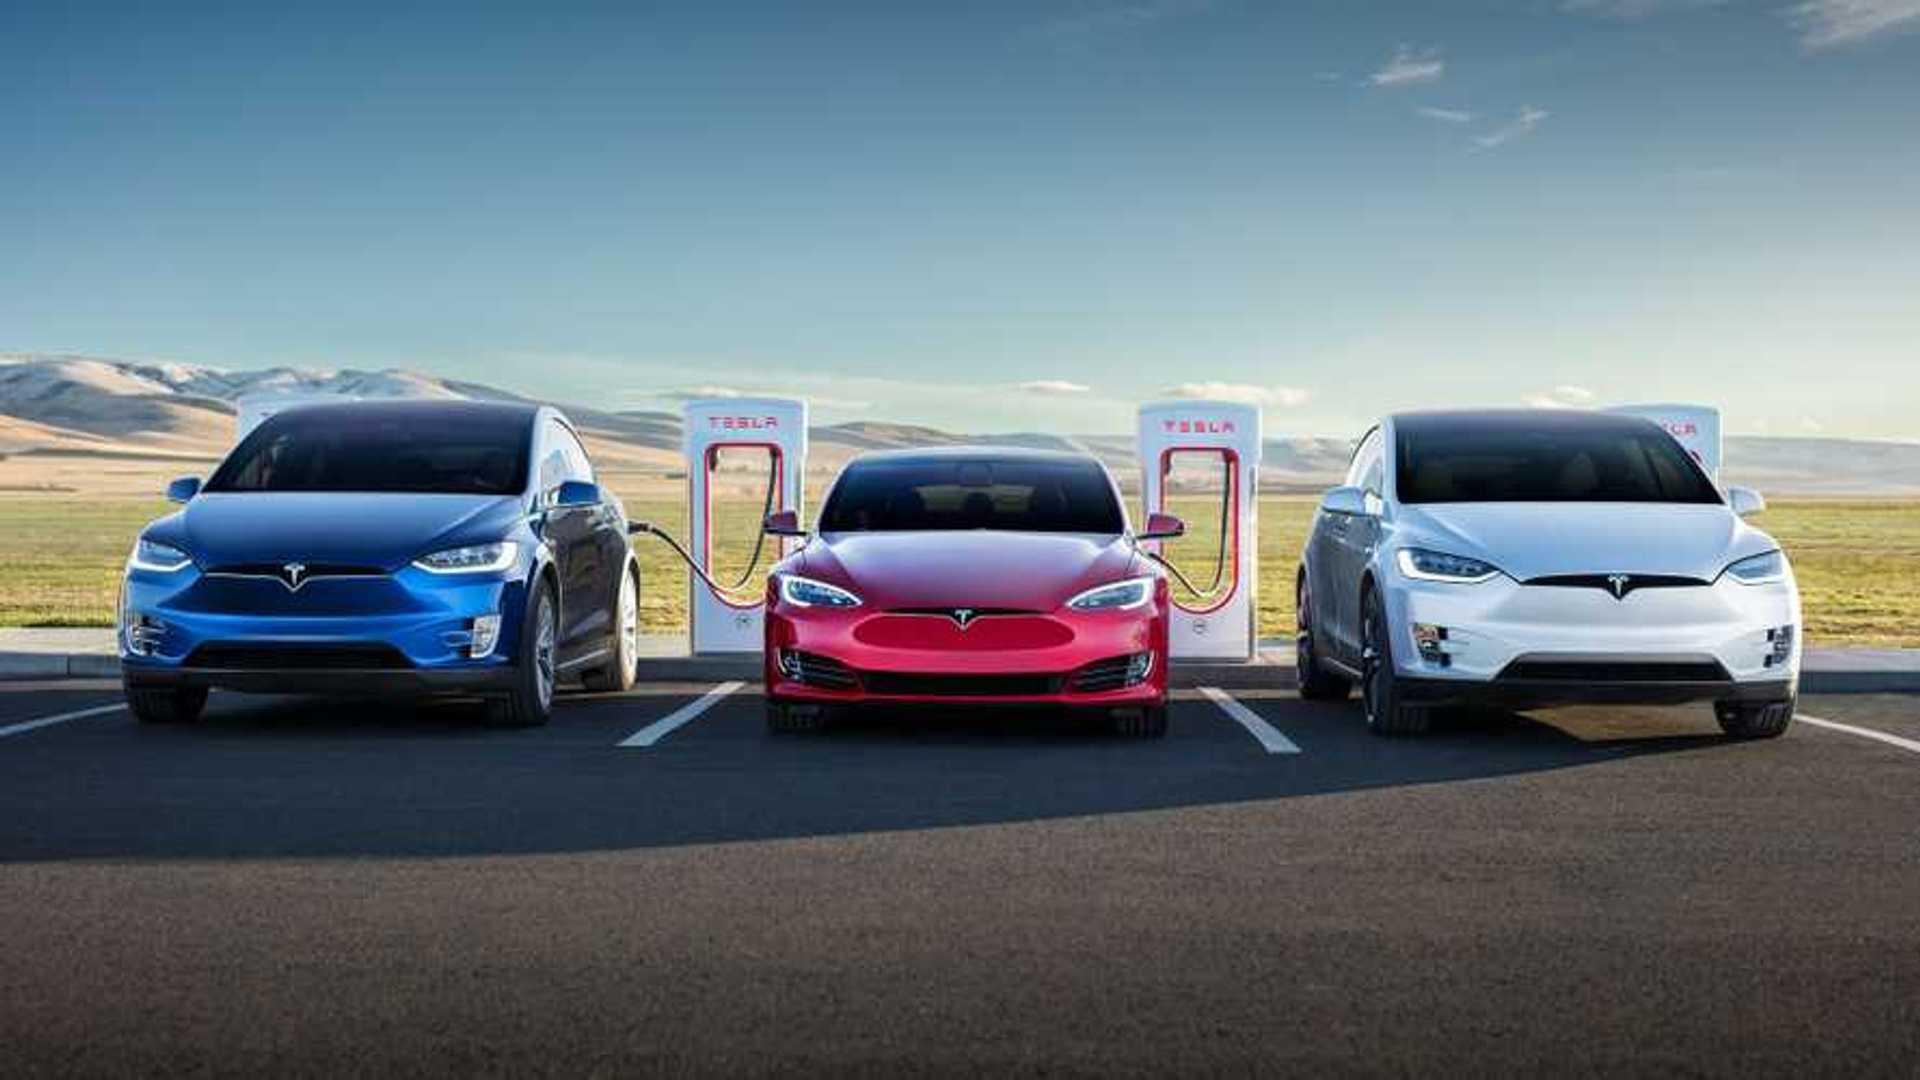 Tesla Tweets cover image